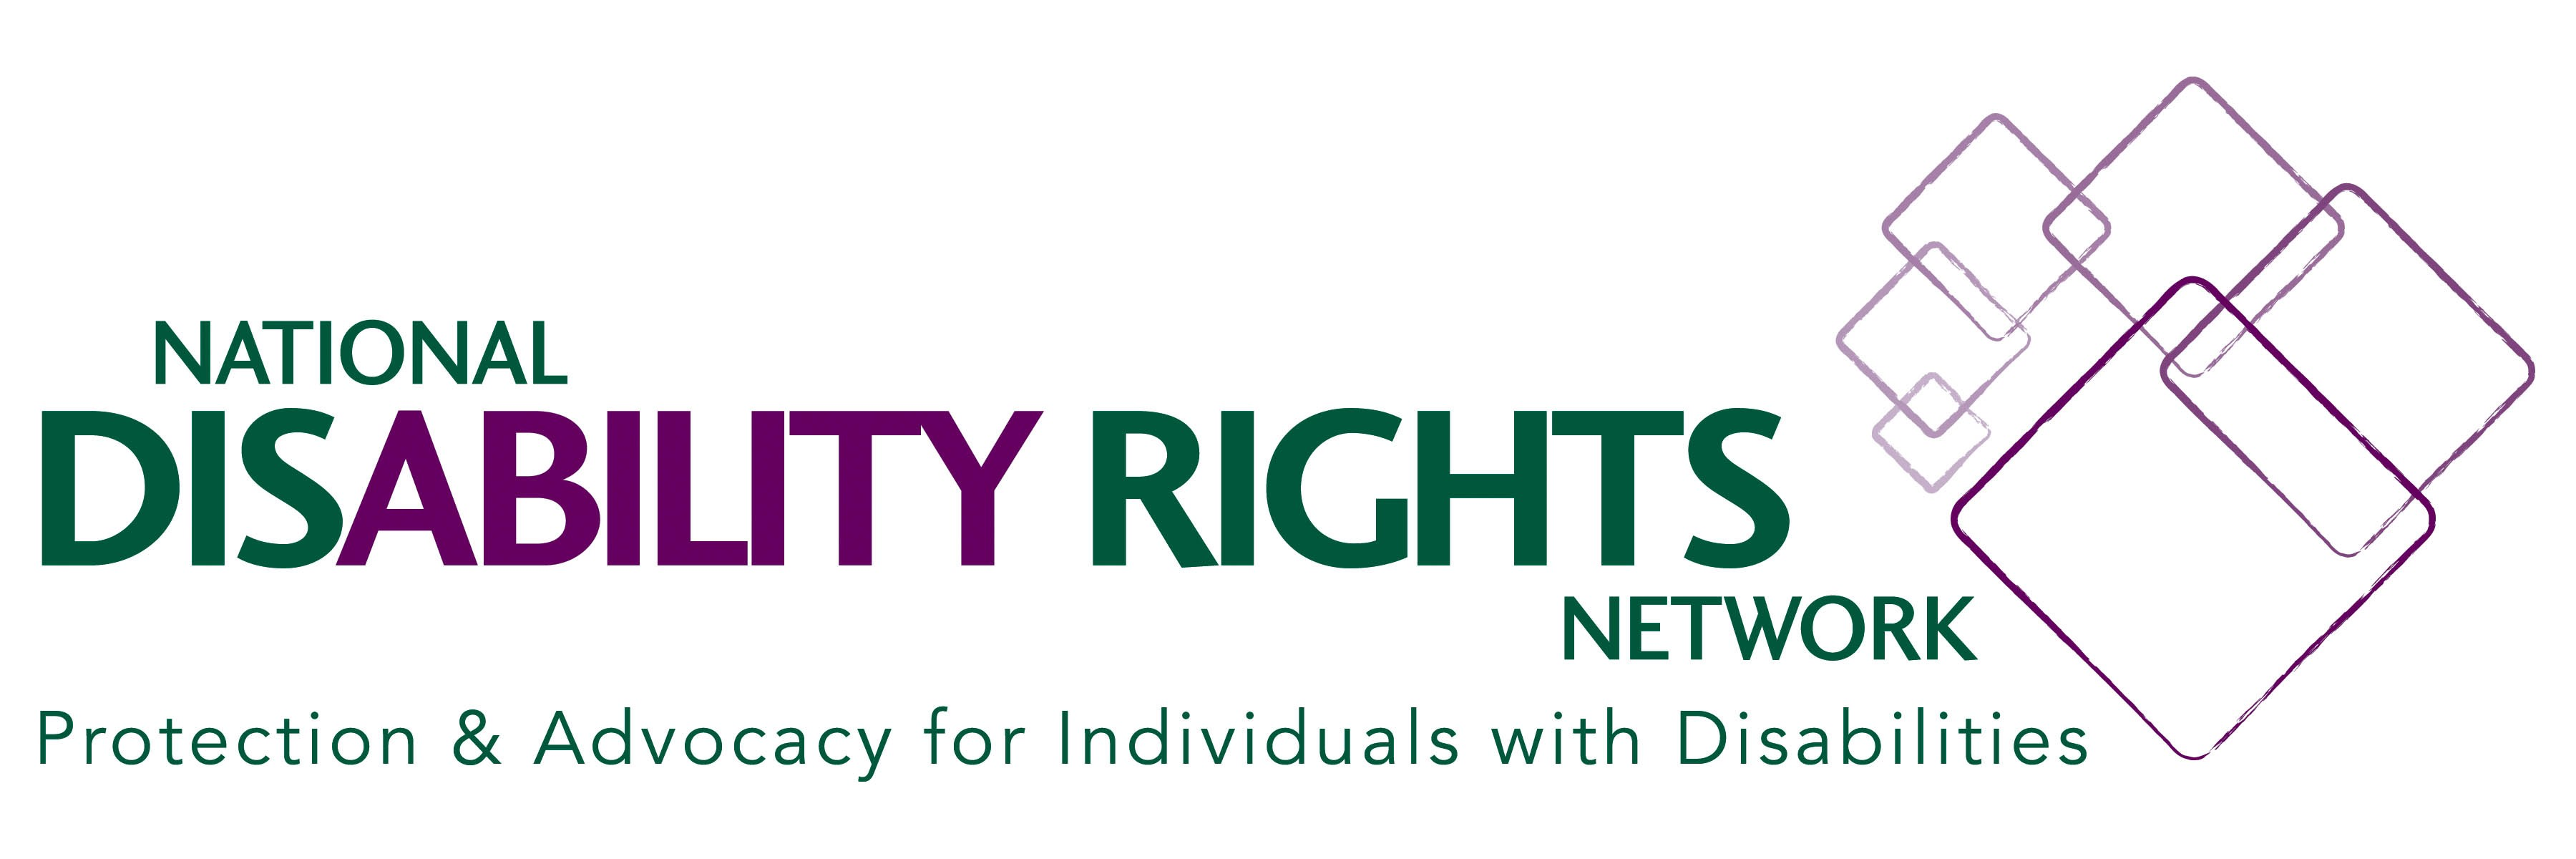 NDRN name and logo.